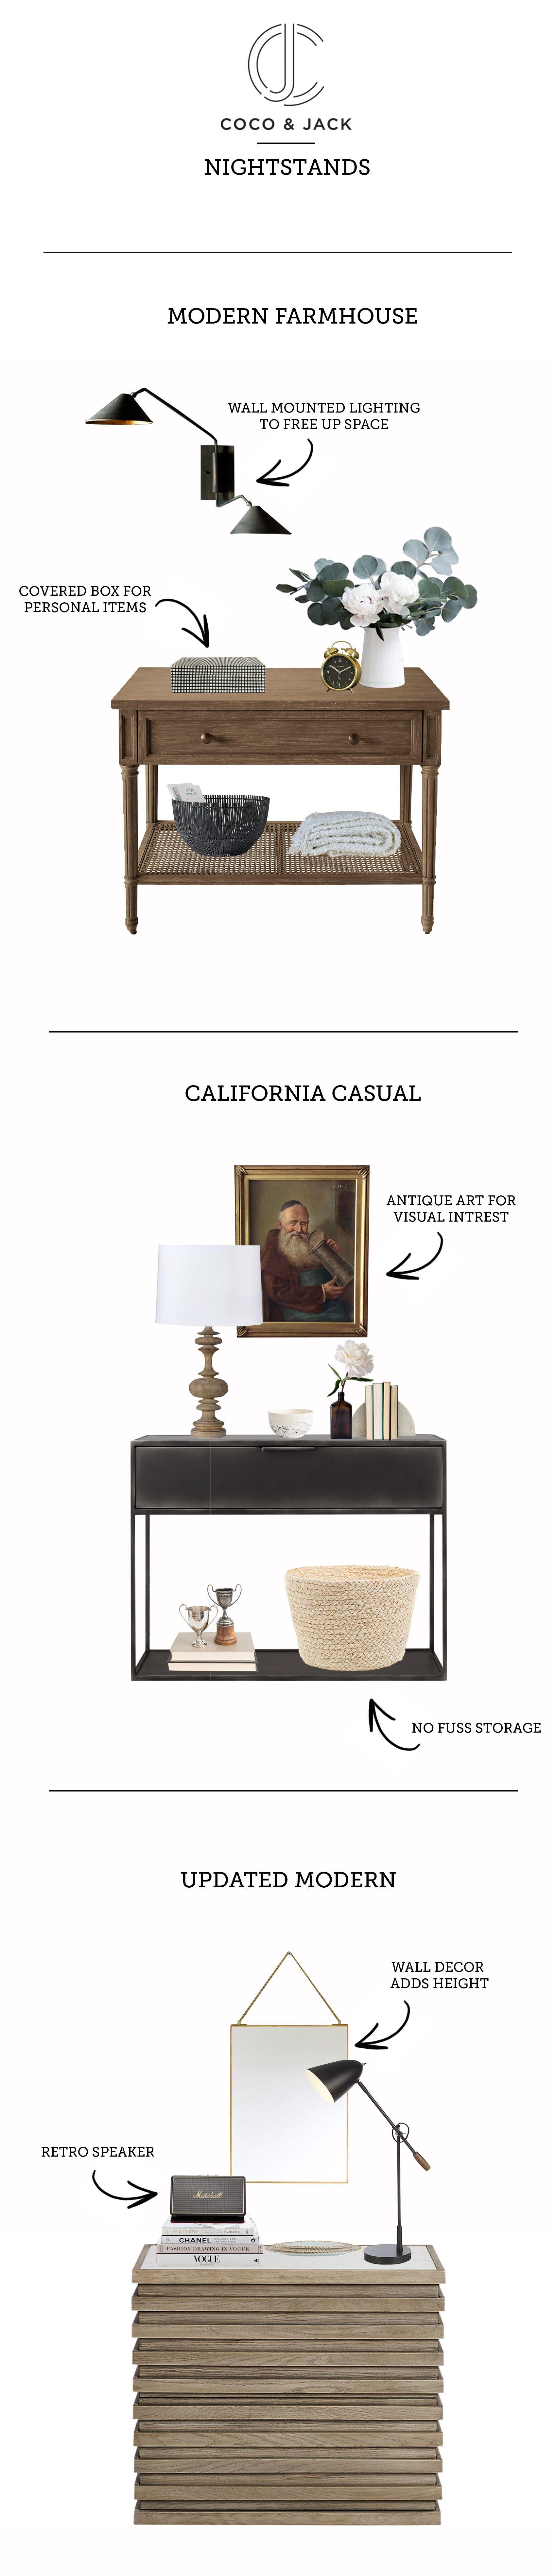 Best Get The Look Nightstands Modern Farmhouse Design Home 400 x 300